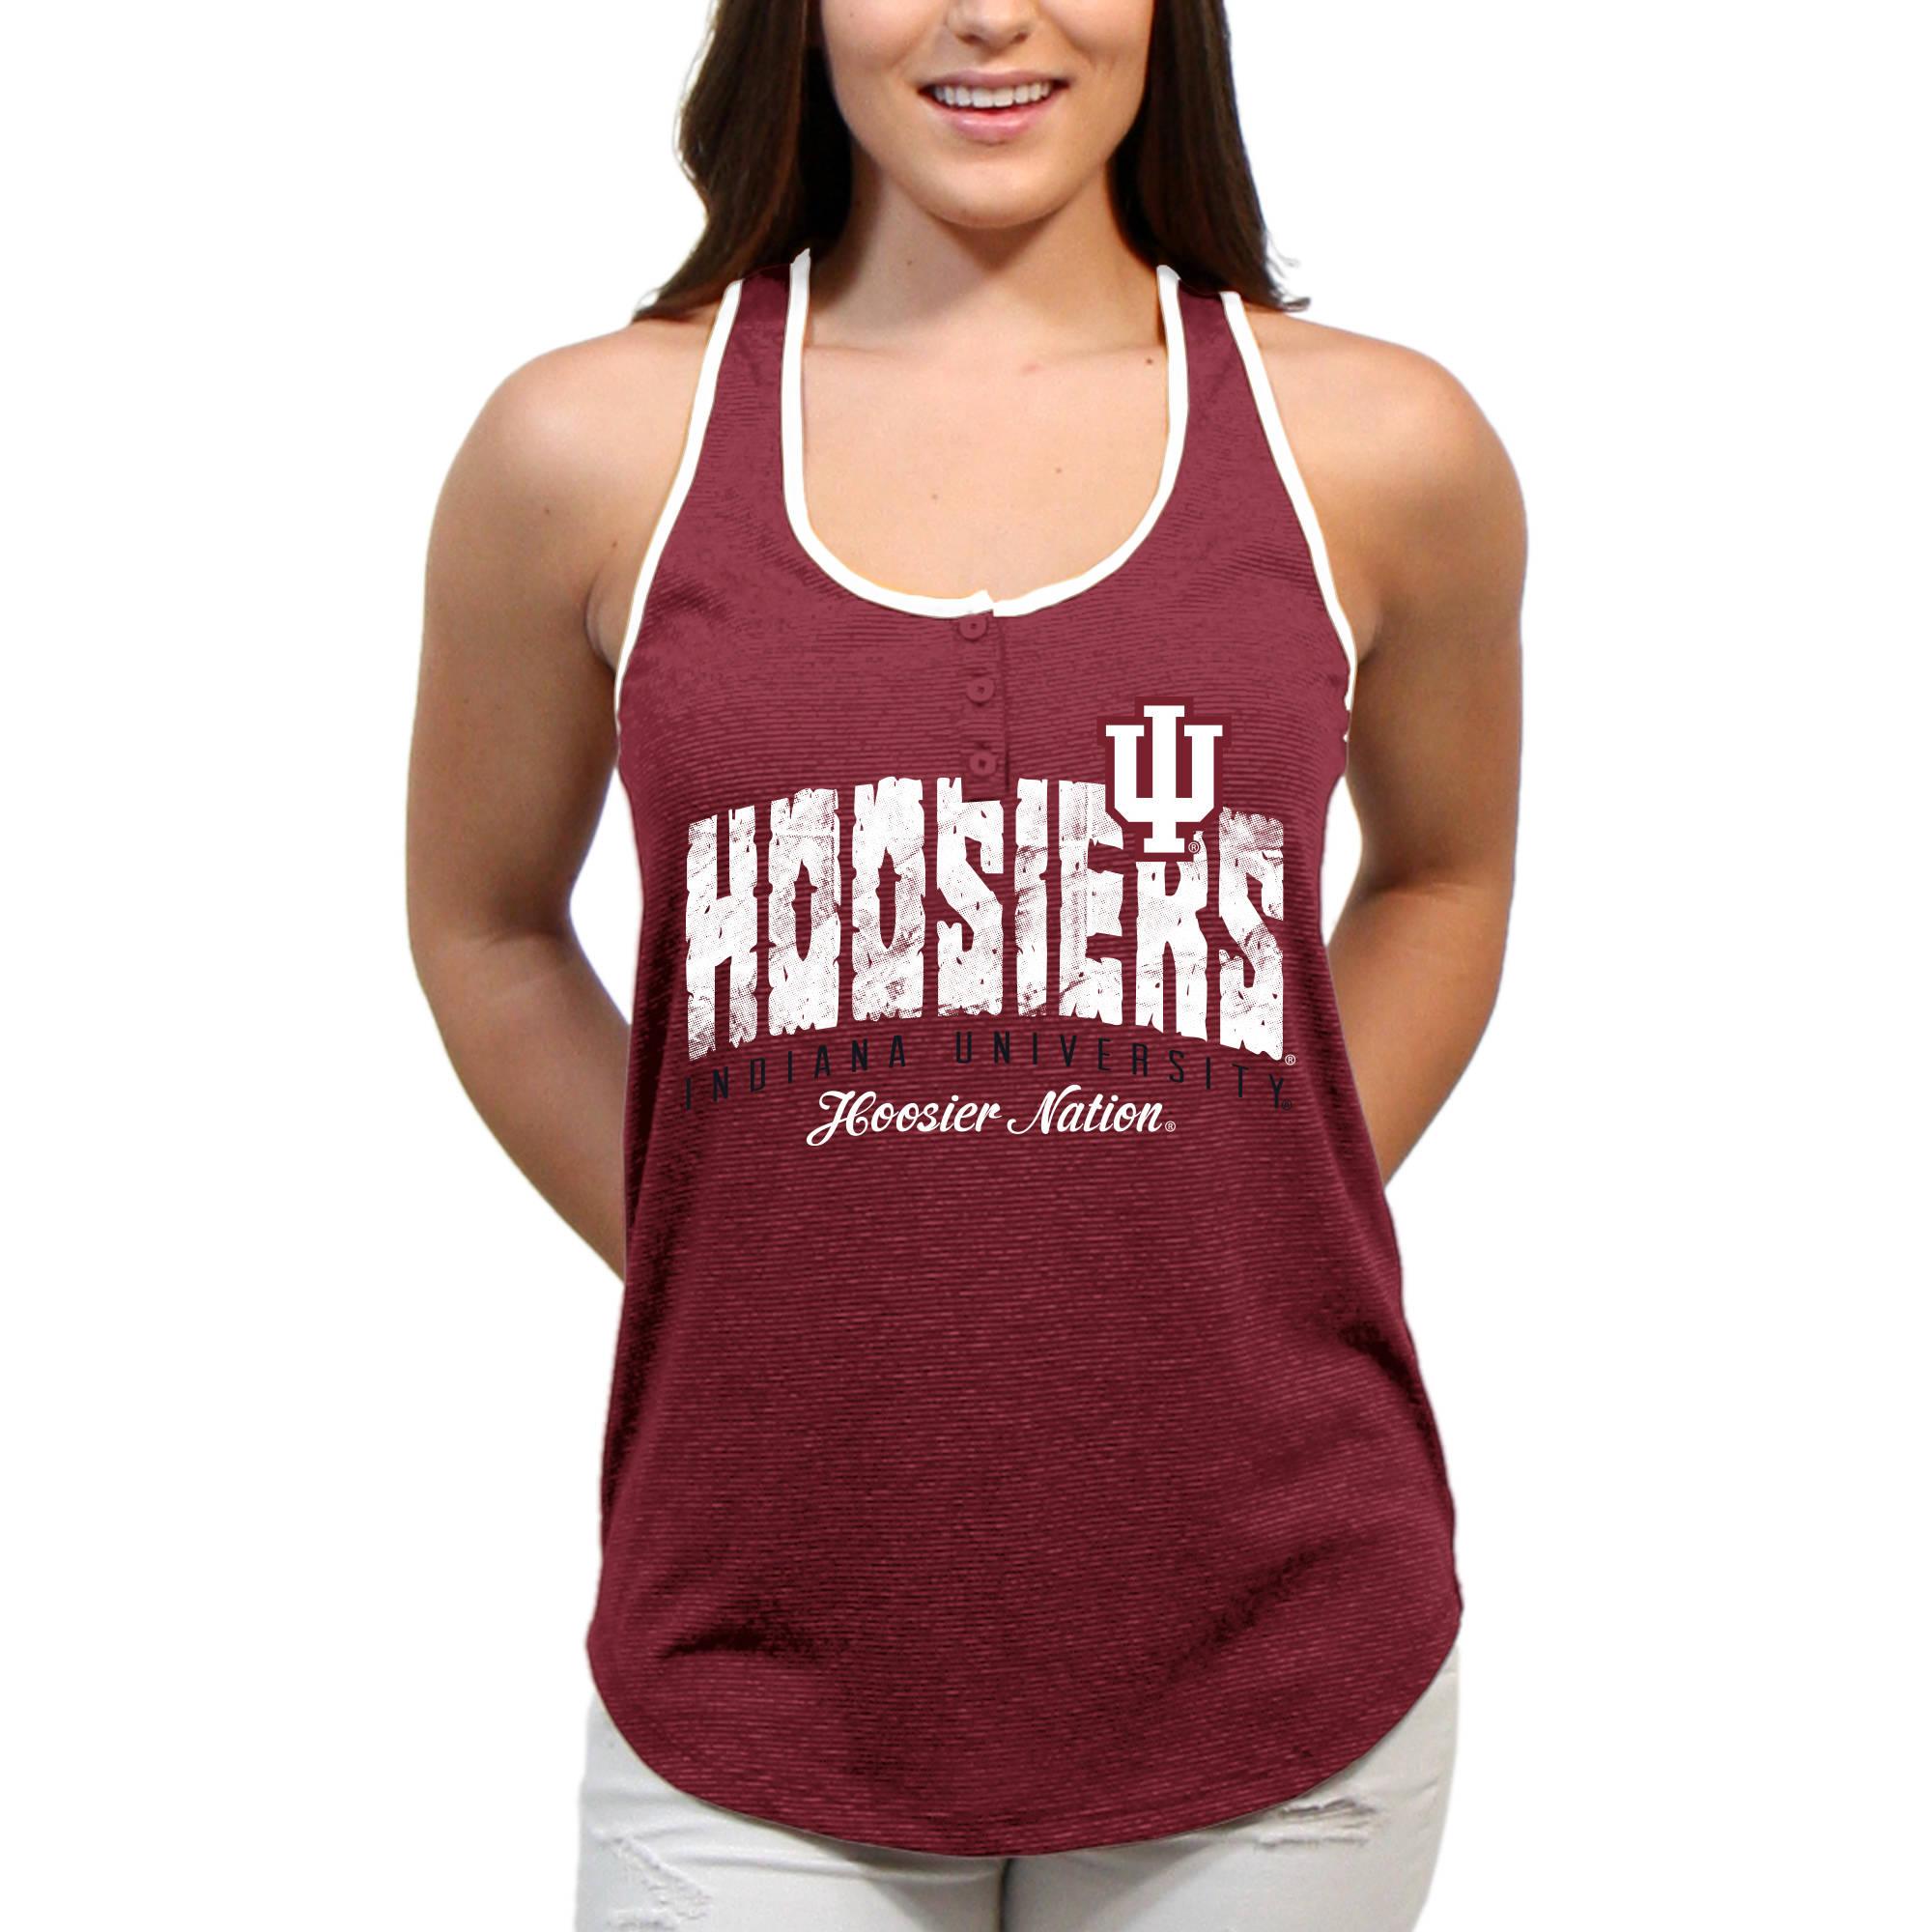 Indiana Hoosiers Choppy Arch Women'S/Juniors Team Tank Top